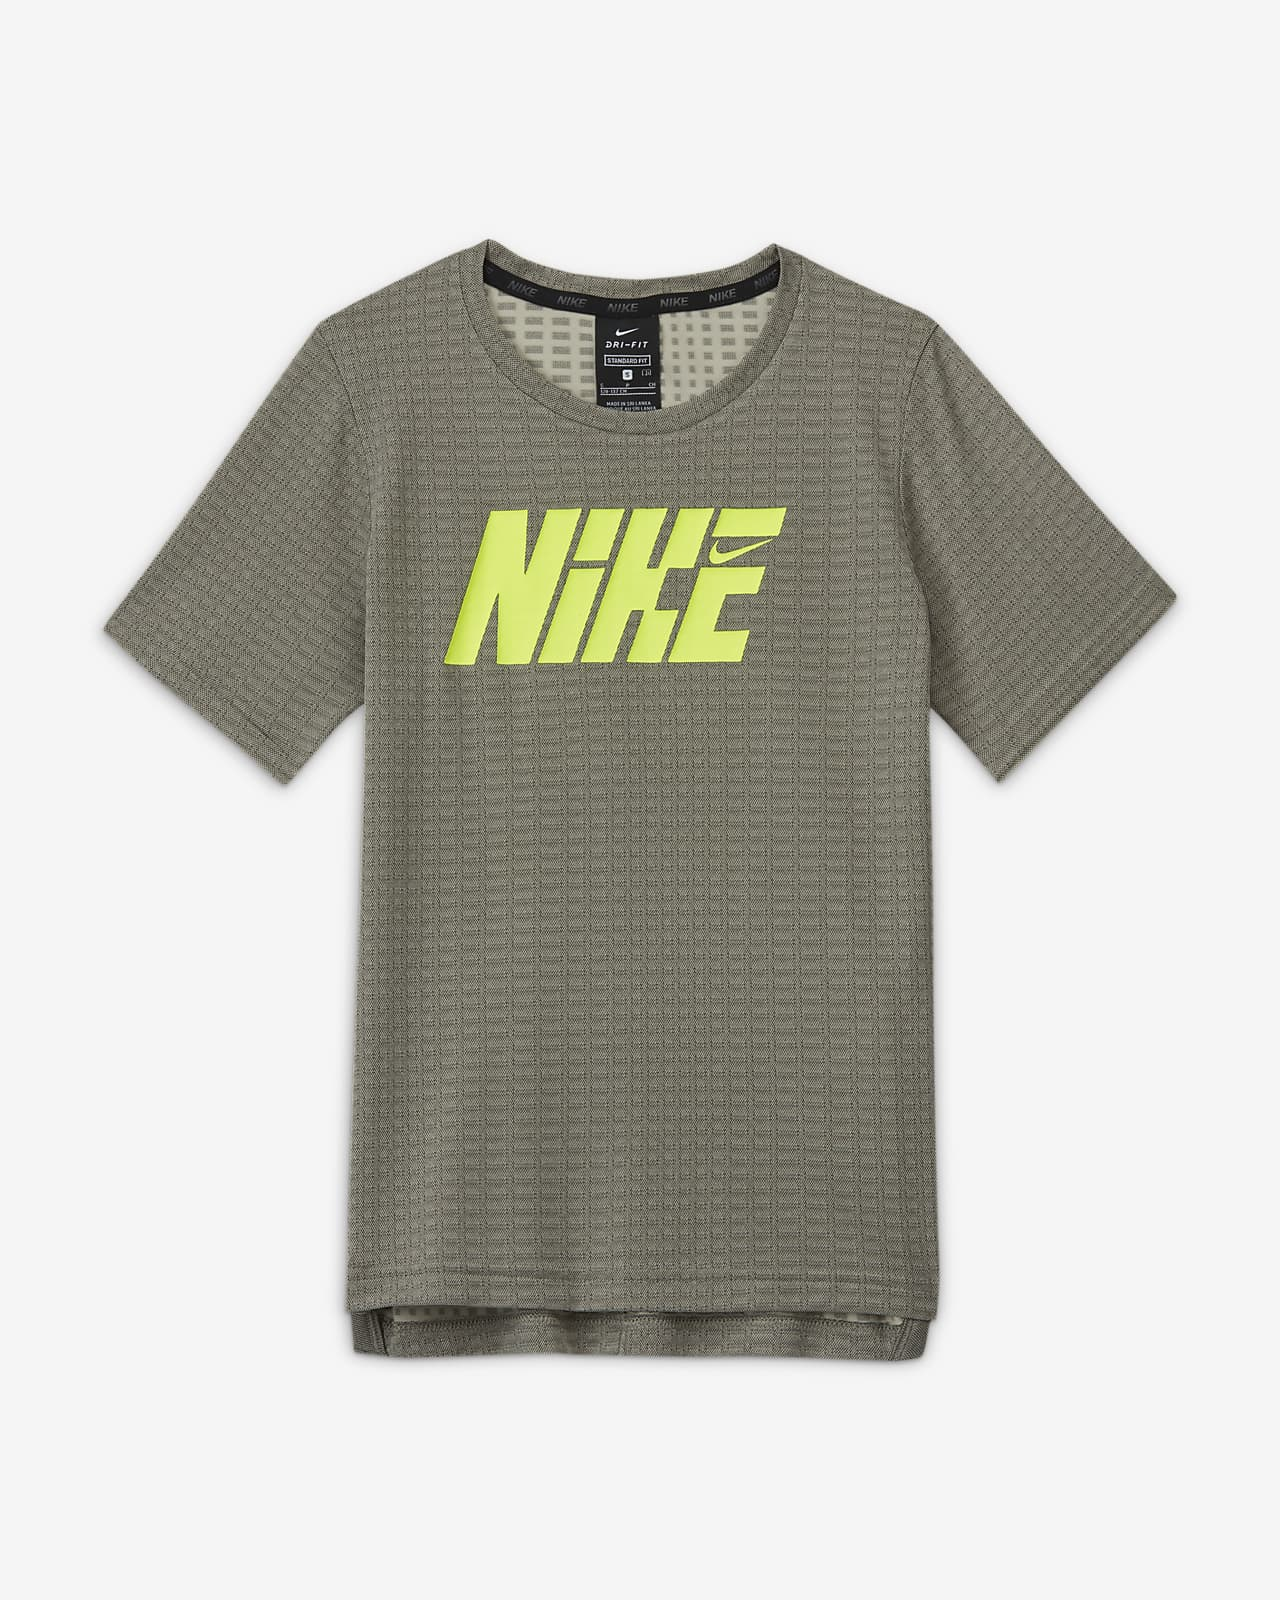 Nike Graphic Kısa Kollu Genç Çocuk (Erkek) Antrenman Üstü